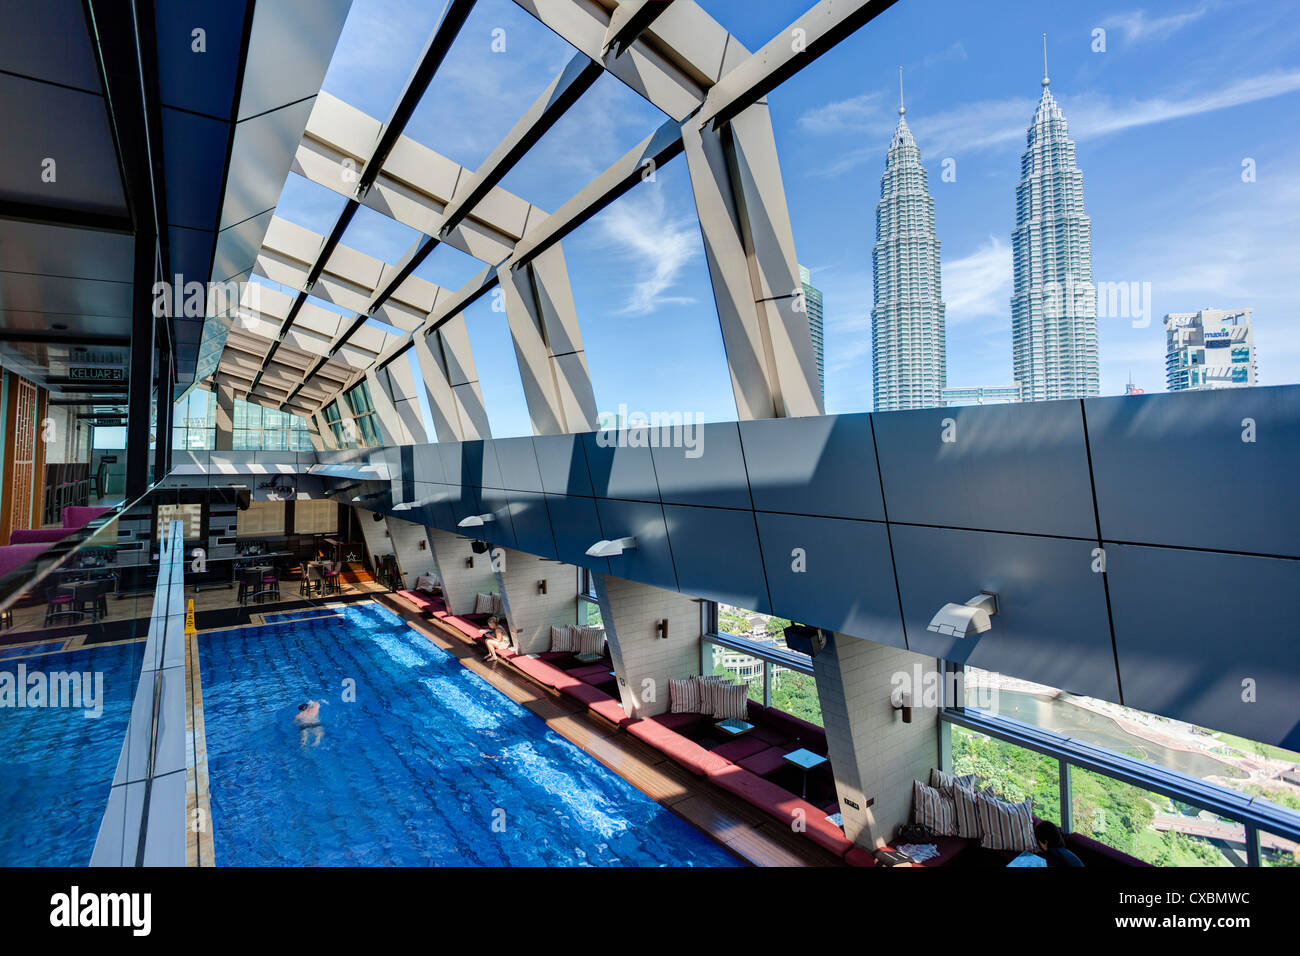 Blick von einer Dachterrasse mit Pool und Skybar des berühmten 88 Petronas Towers, Kuala Lumpur, Malaysia, Stockbild